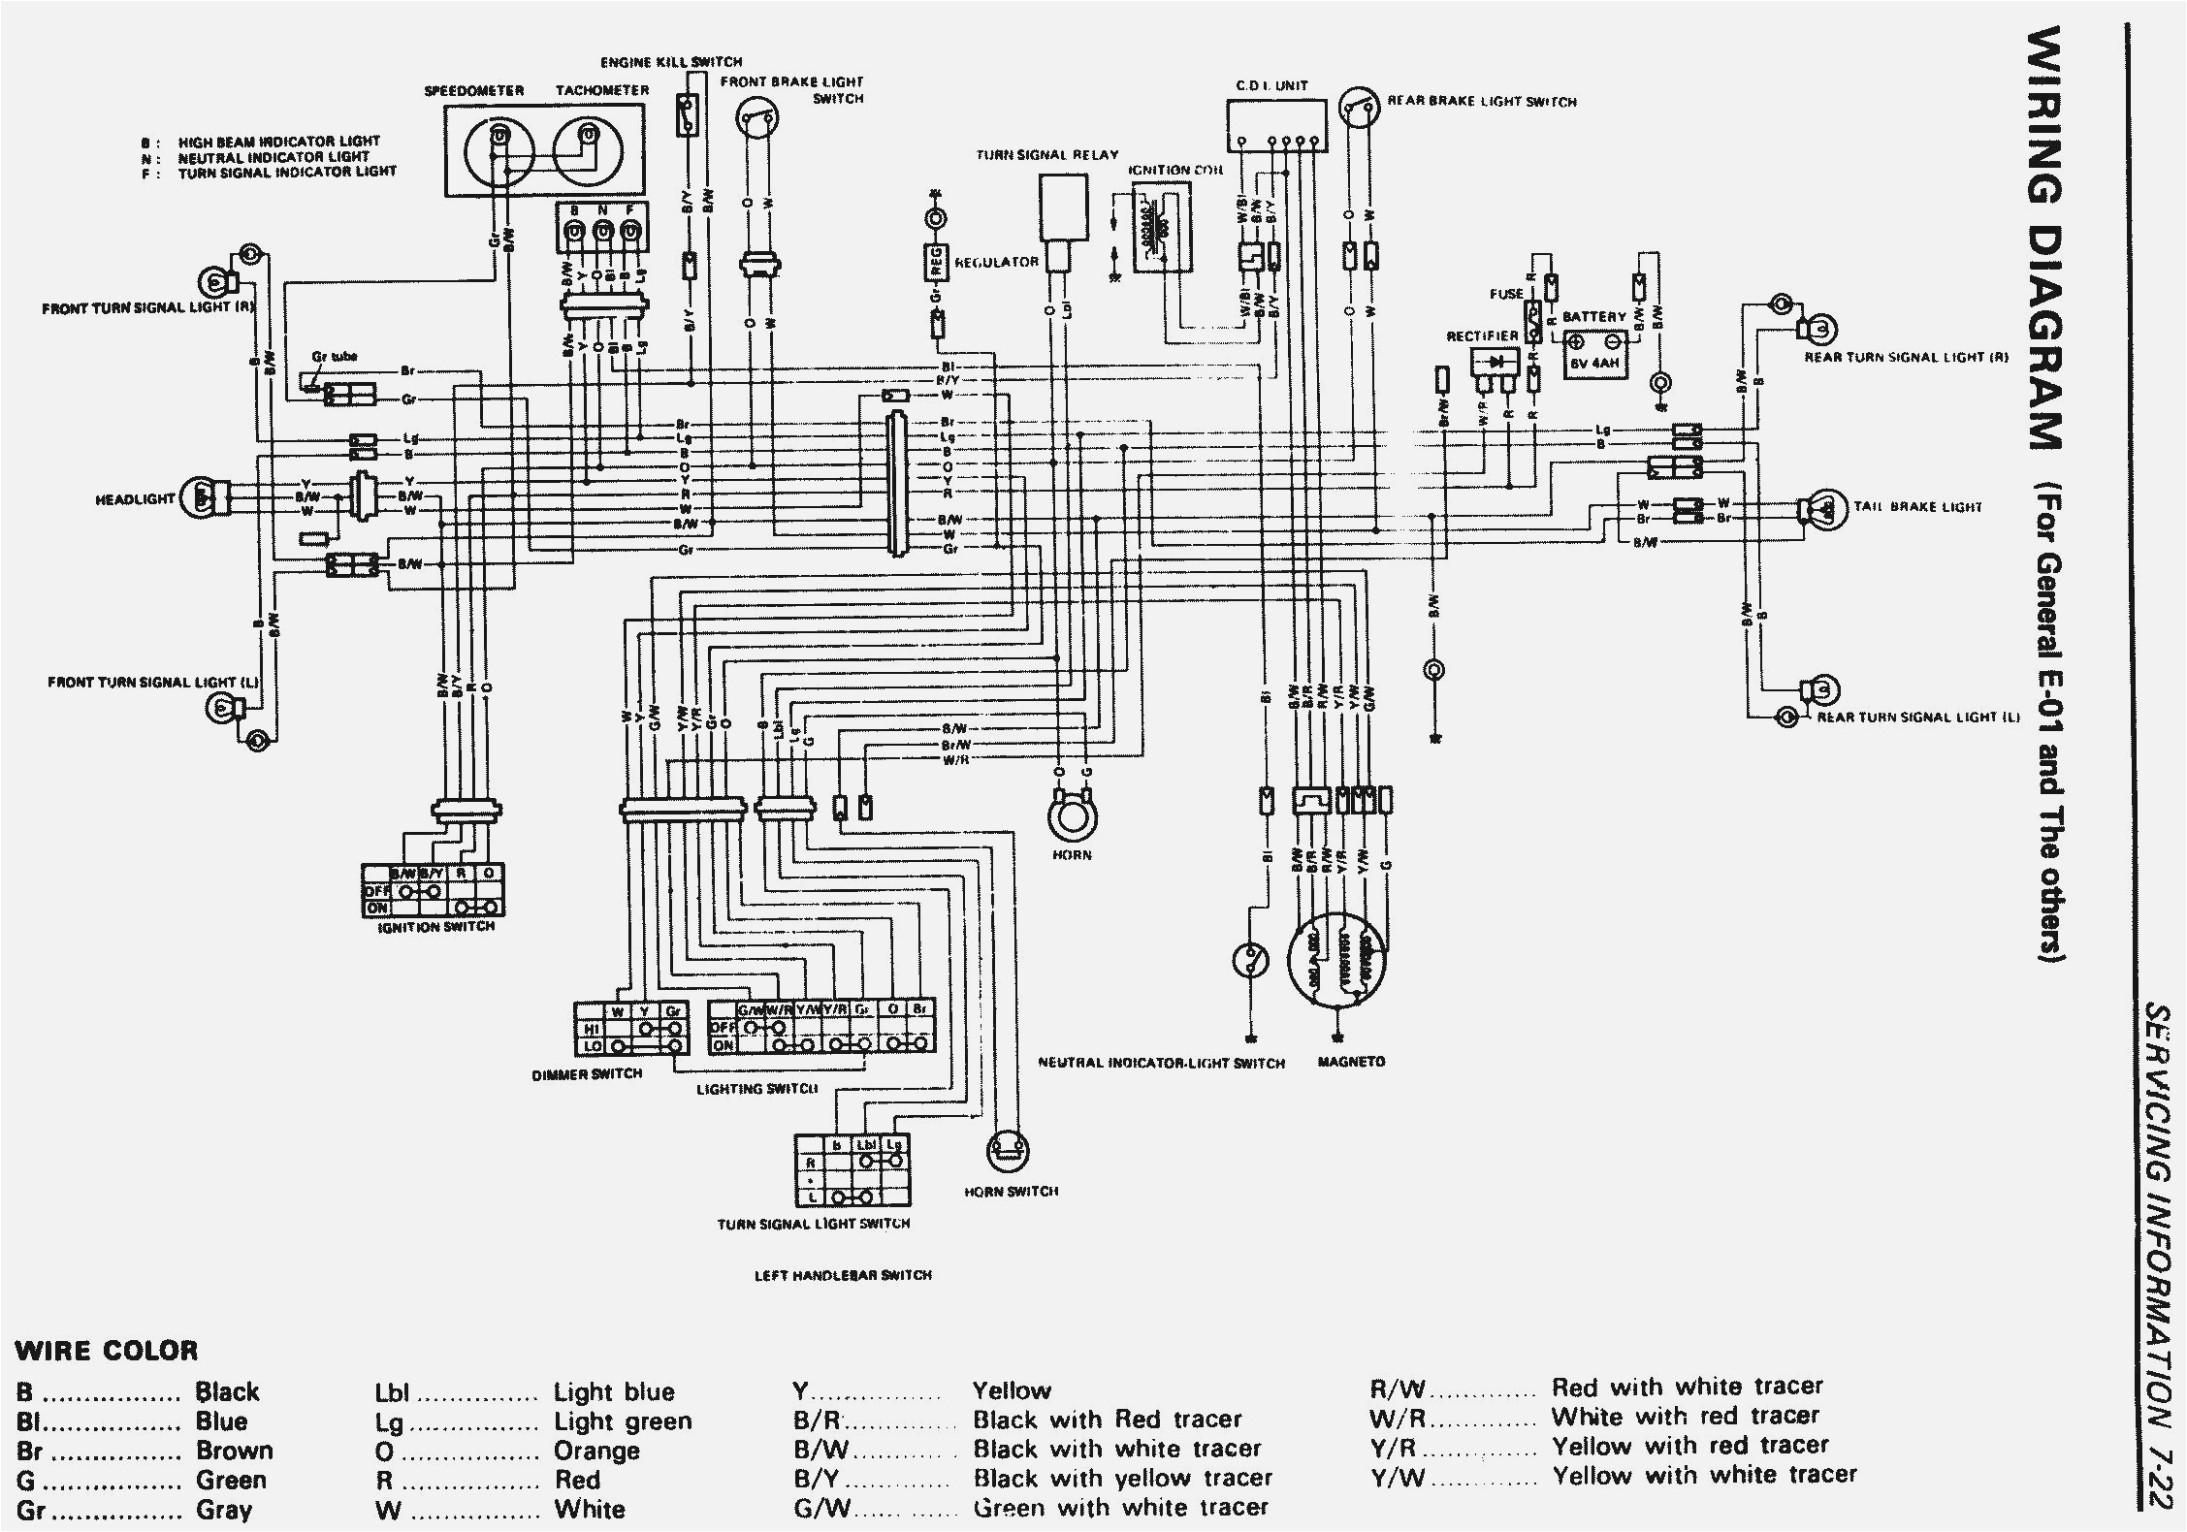 suzuki kei wiring diagram wiring diagrams second suzuki atv wiring diagrams wiring diagram sample suzuki kei